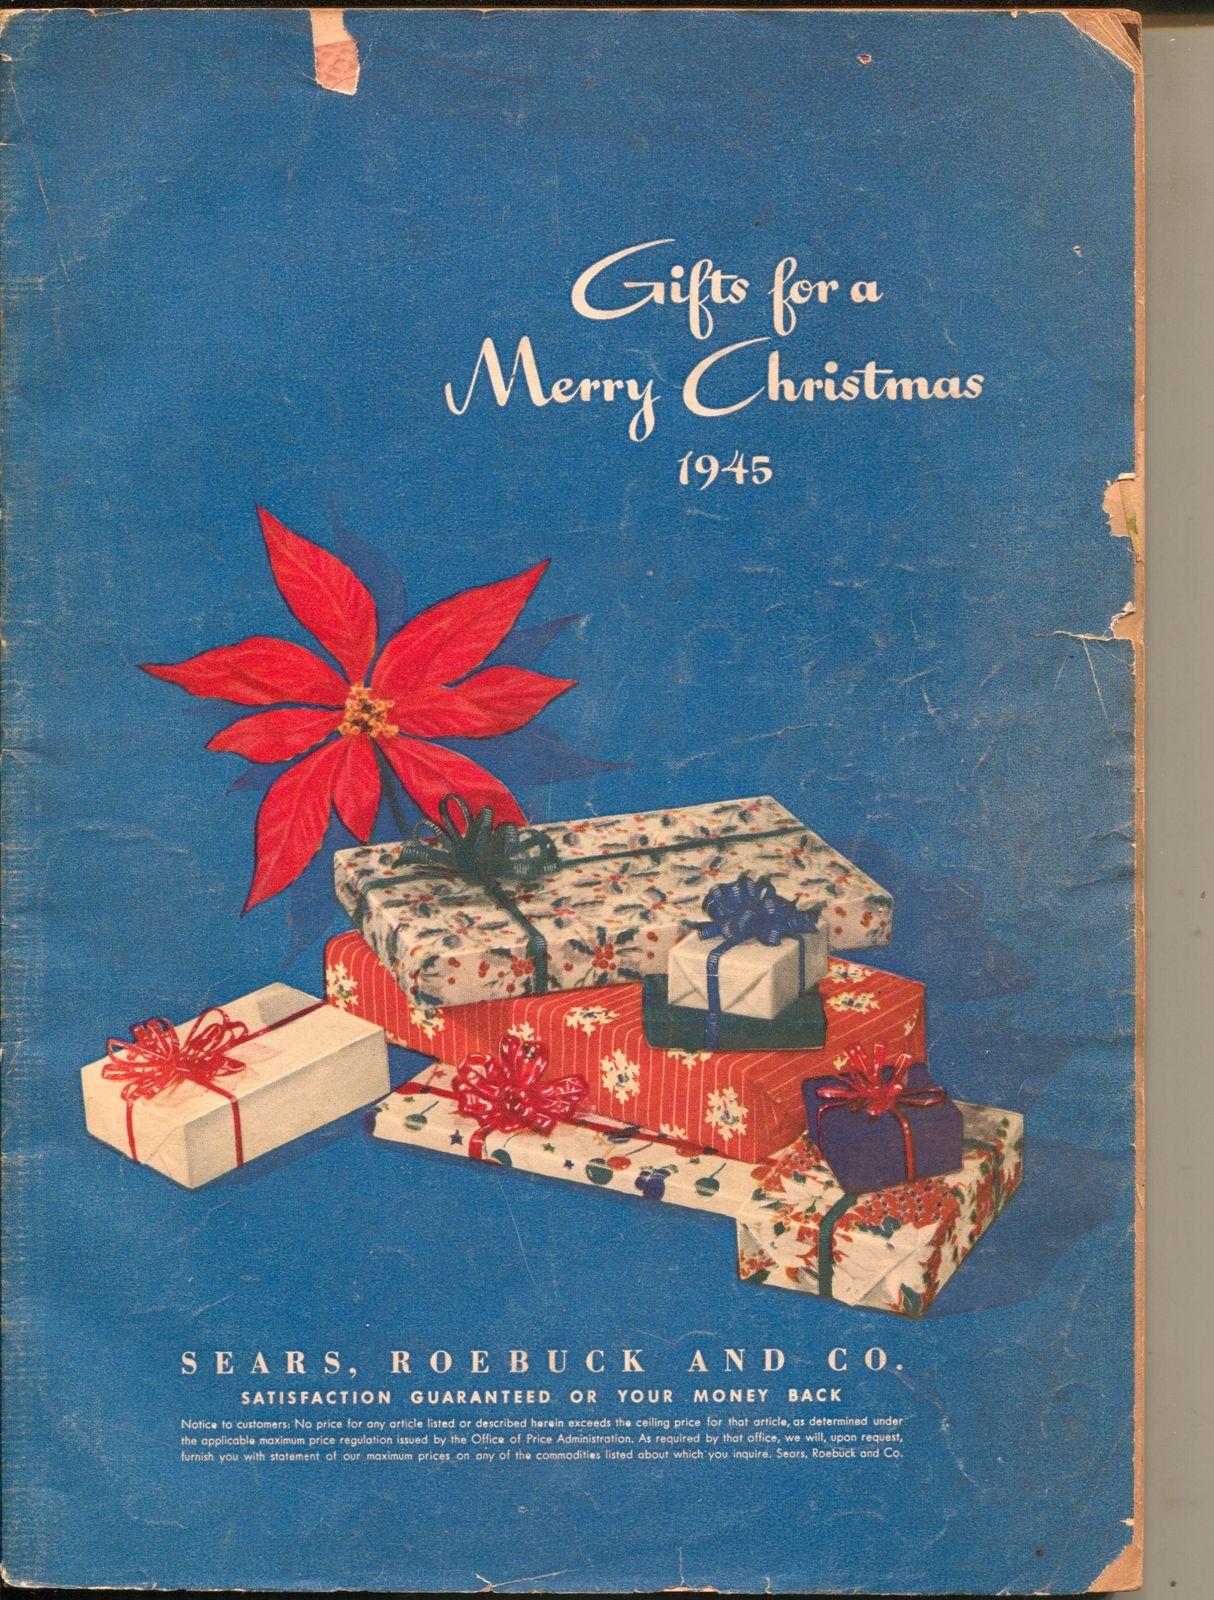 Sears Christmas Catalog.Sears Christmas Catalog 1945 Toys Fashions Dolls Decorations